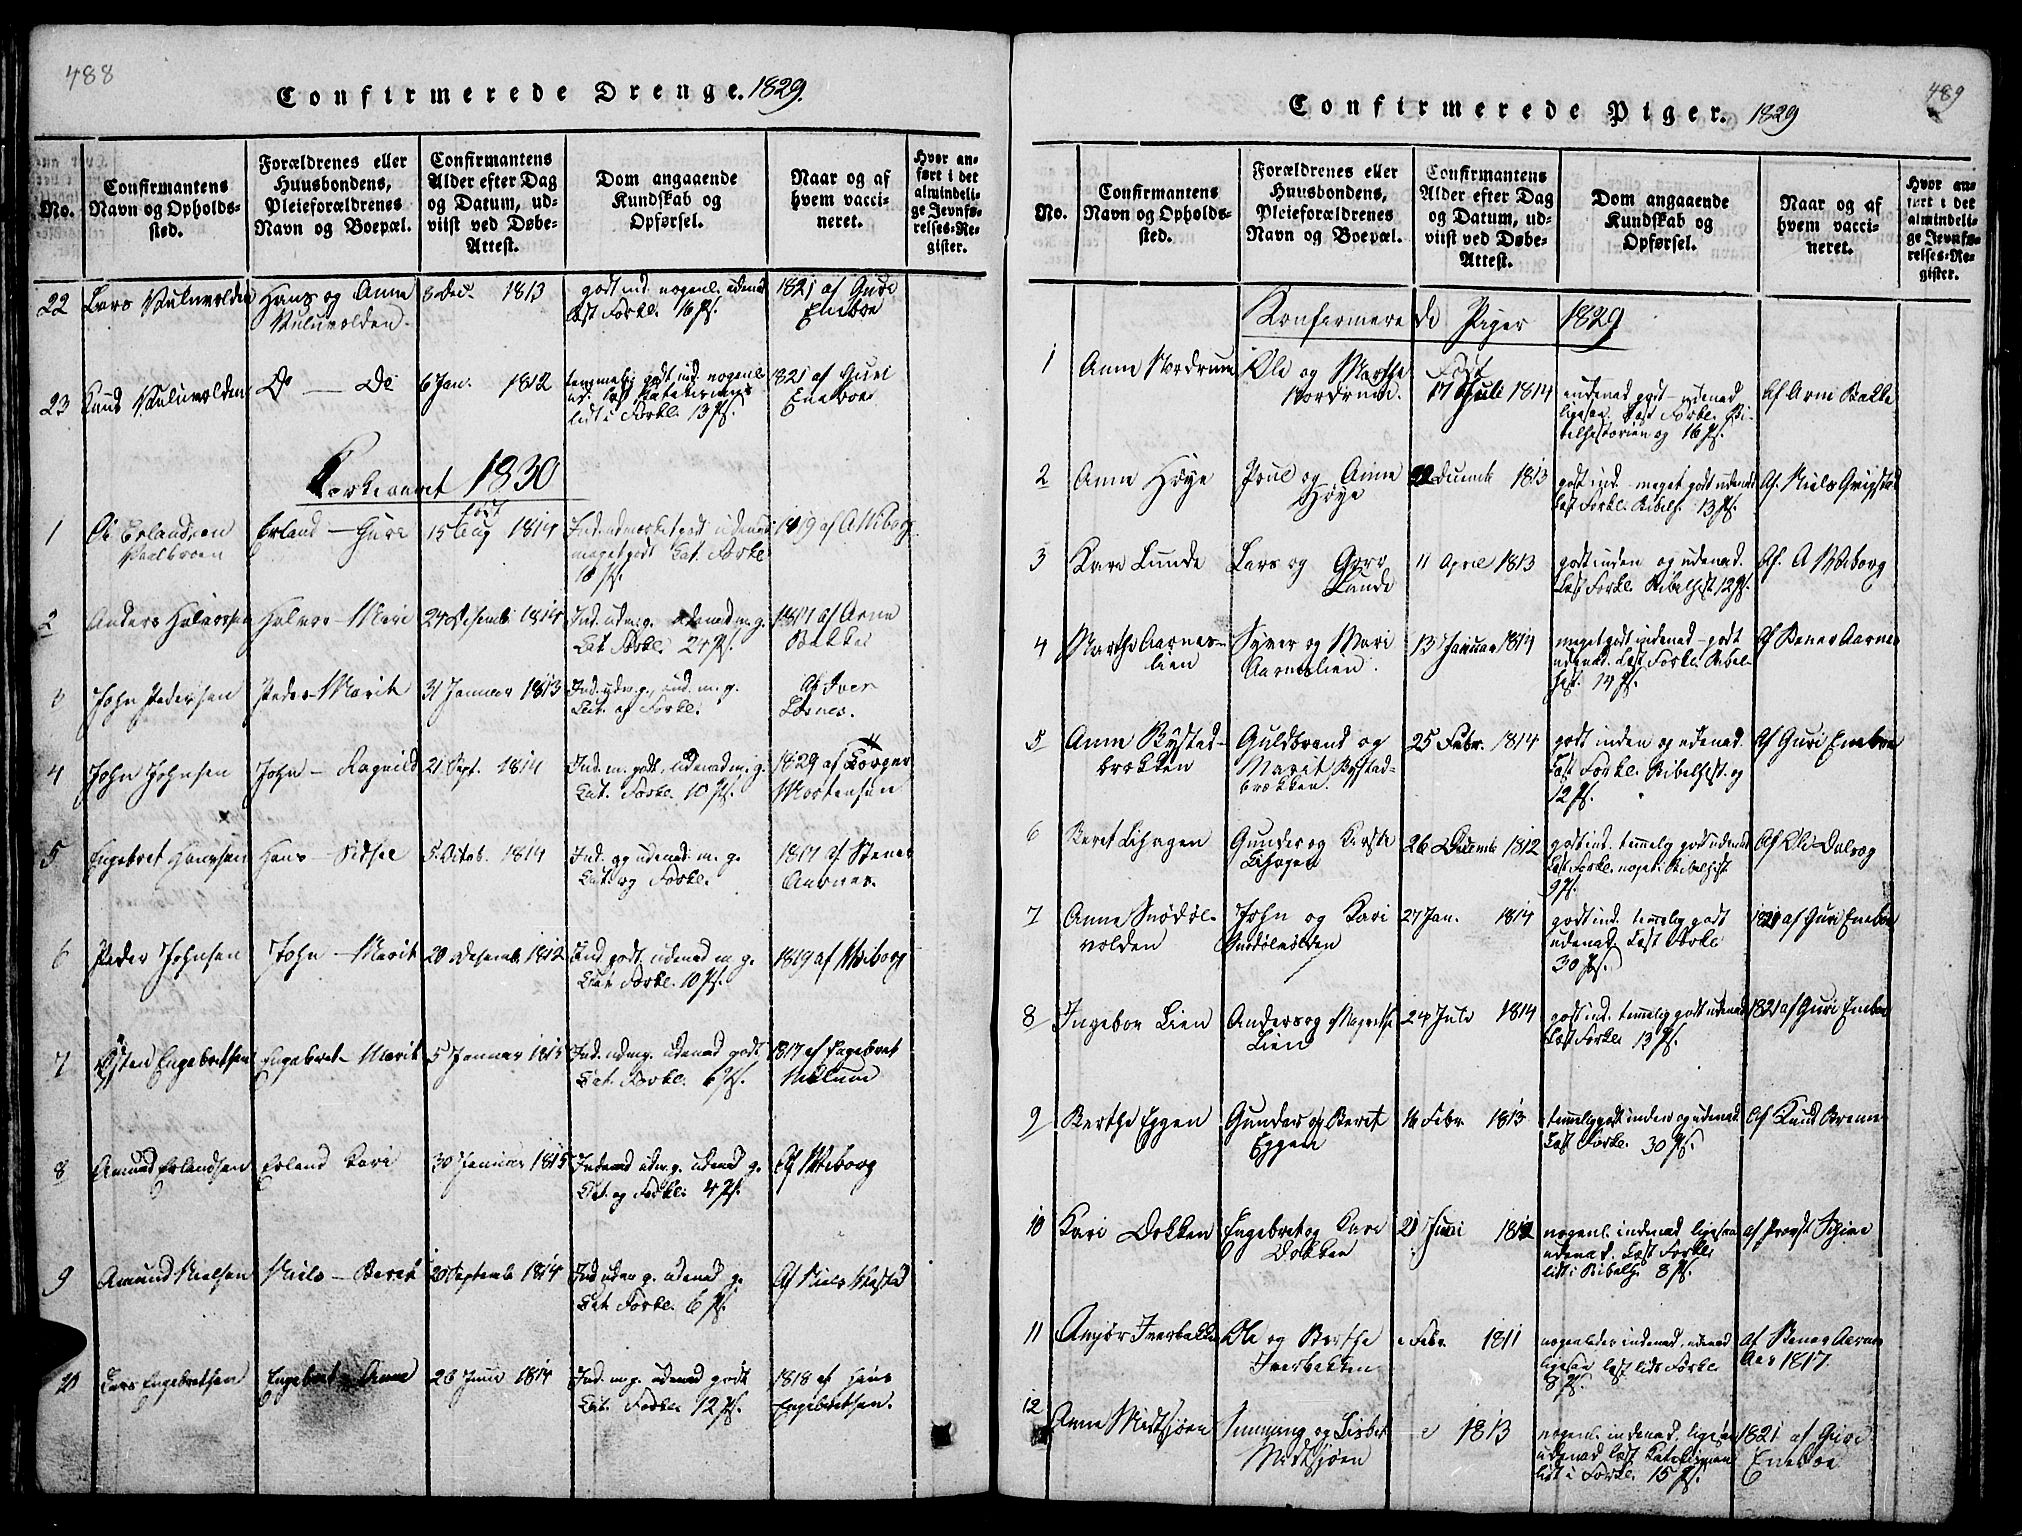 SAH, Ringebu prestekontor, Klokkerbok nr. 1, 1821-1839, s. 488-489